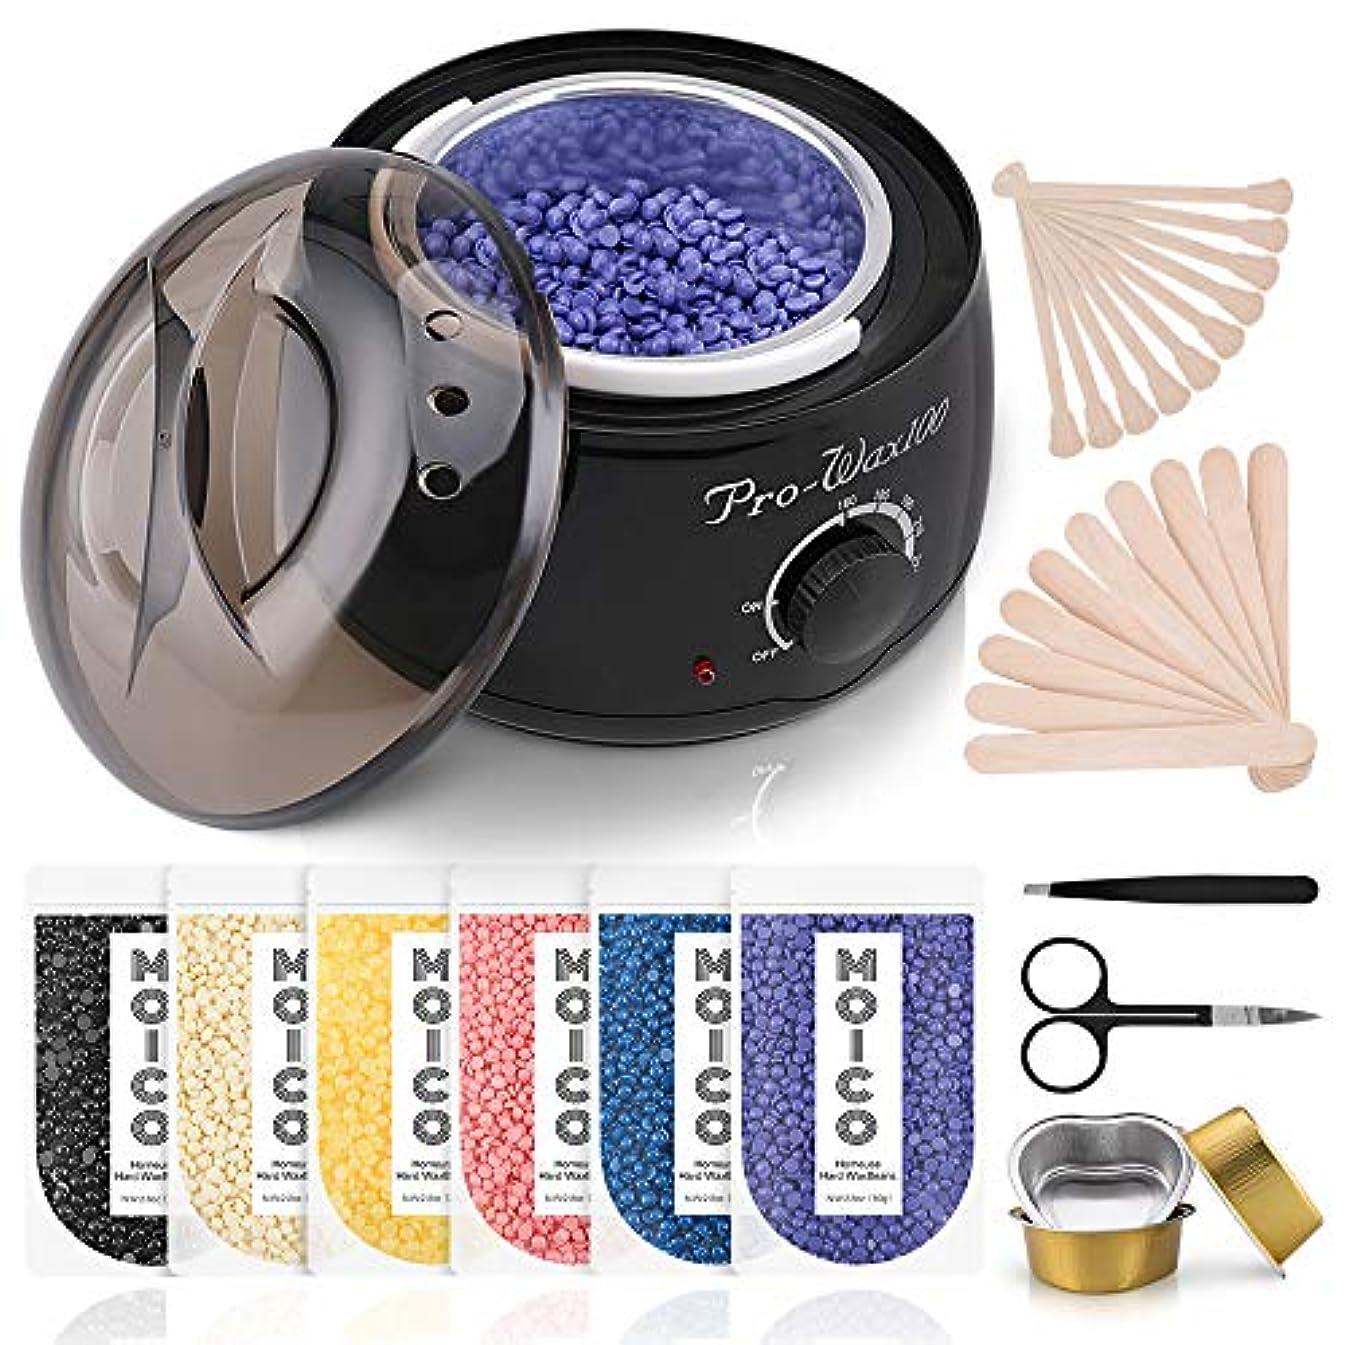 Home Waxing Kit, Wax Warmer Hair Removal Wax Kit with 6 Bags Hard Wax Beans for Full Body, Legs, Face, Eyebrows, Bikini Wax Women Men Painless Waxing